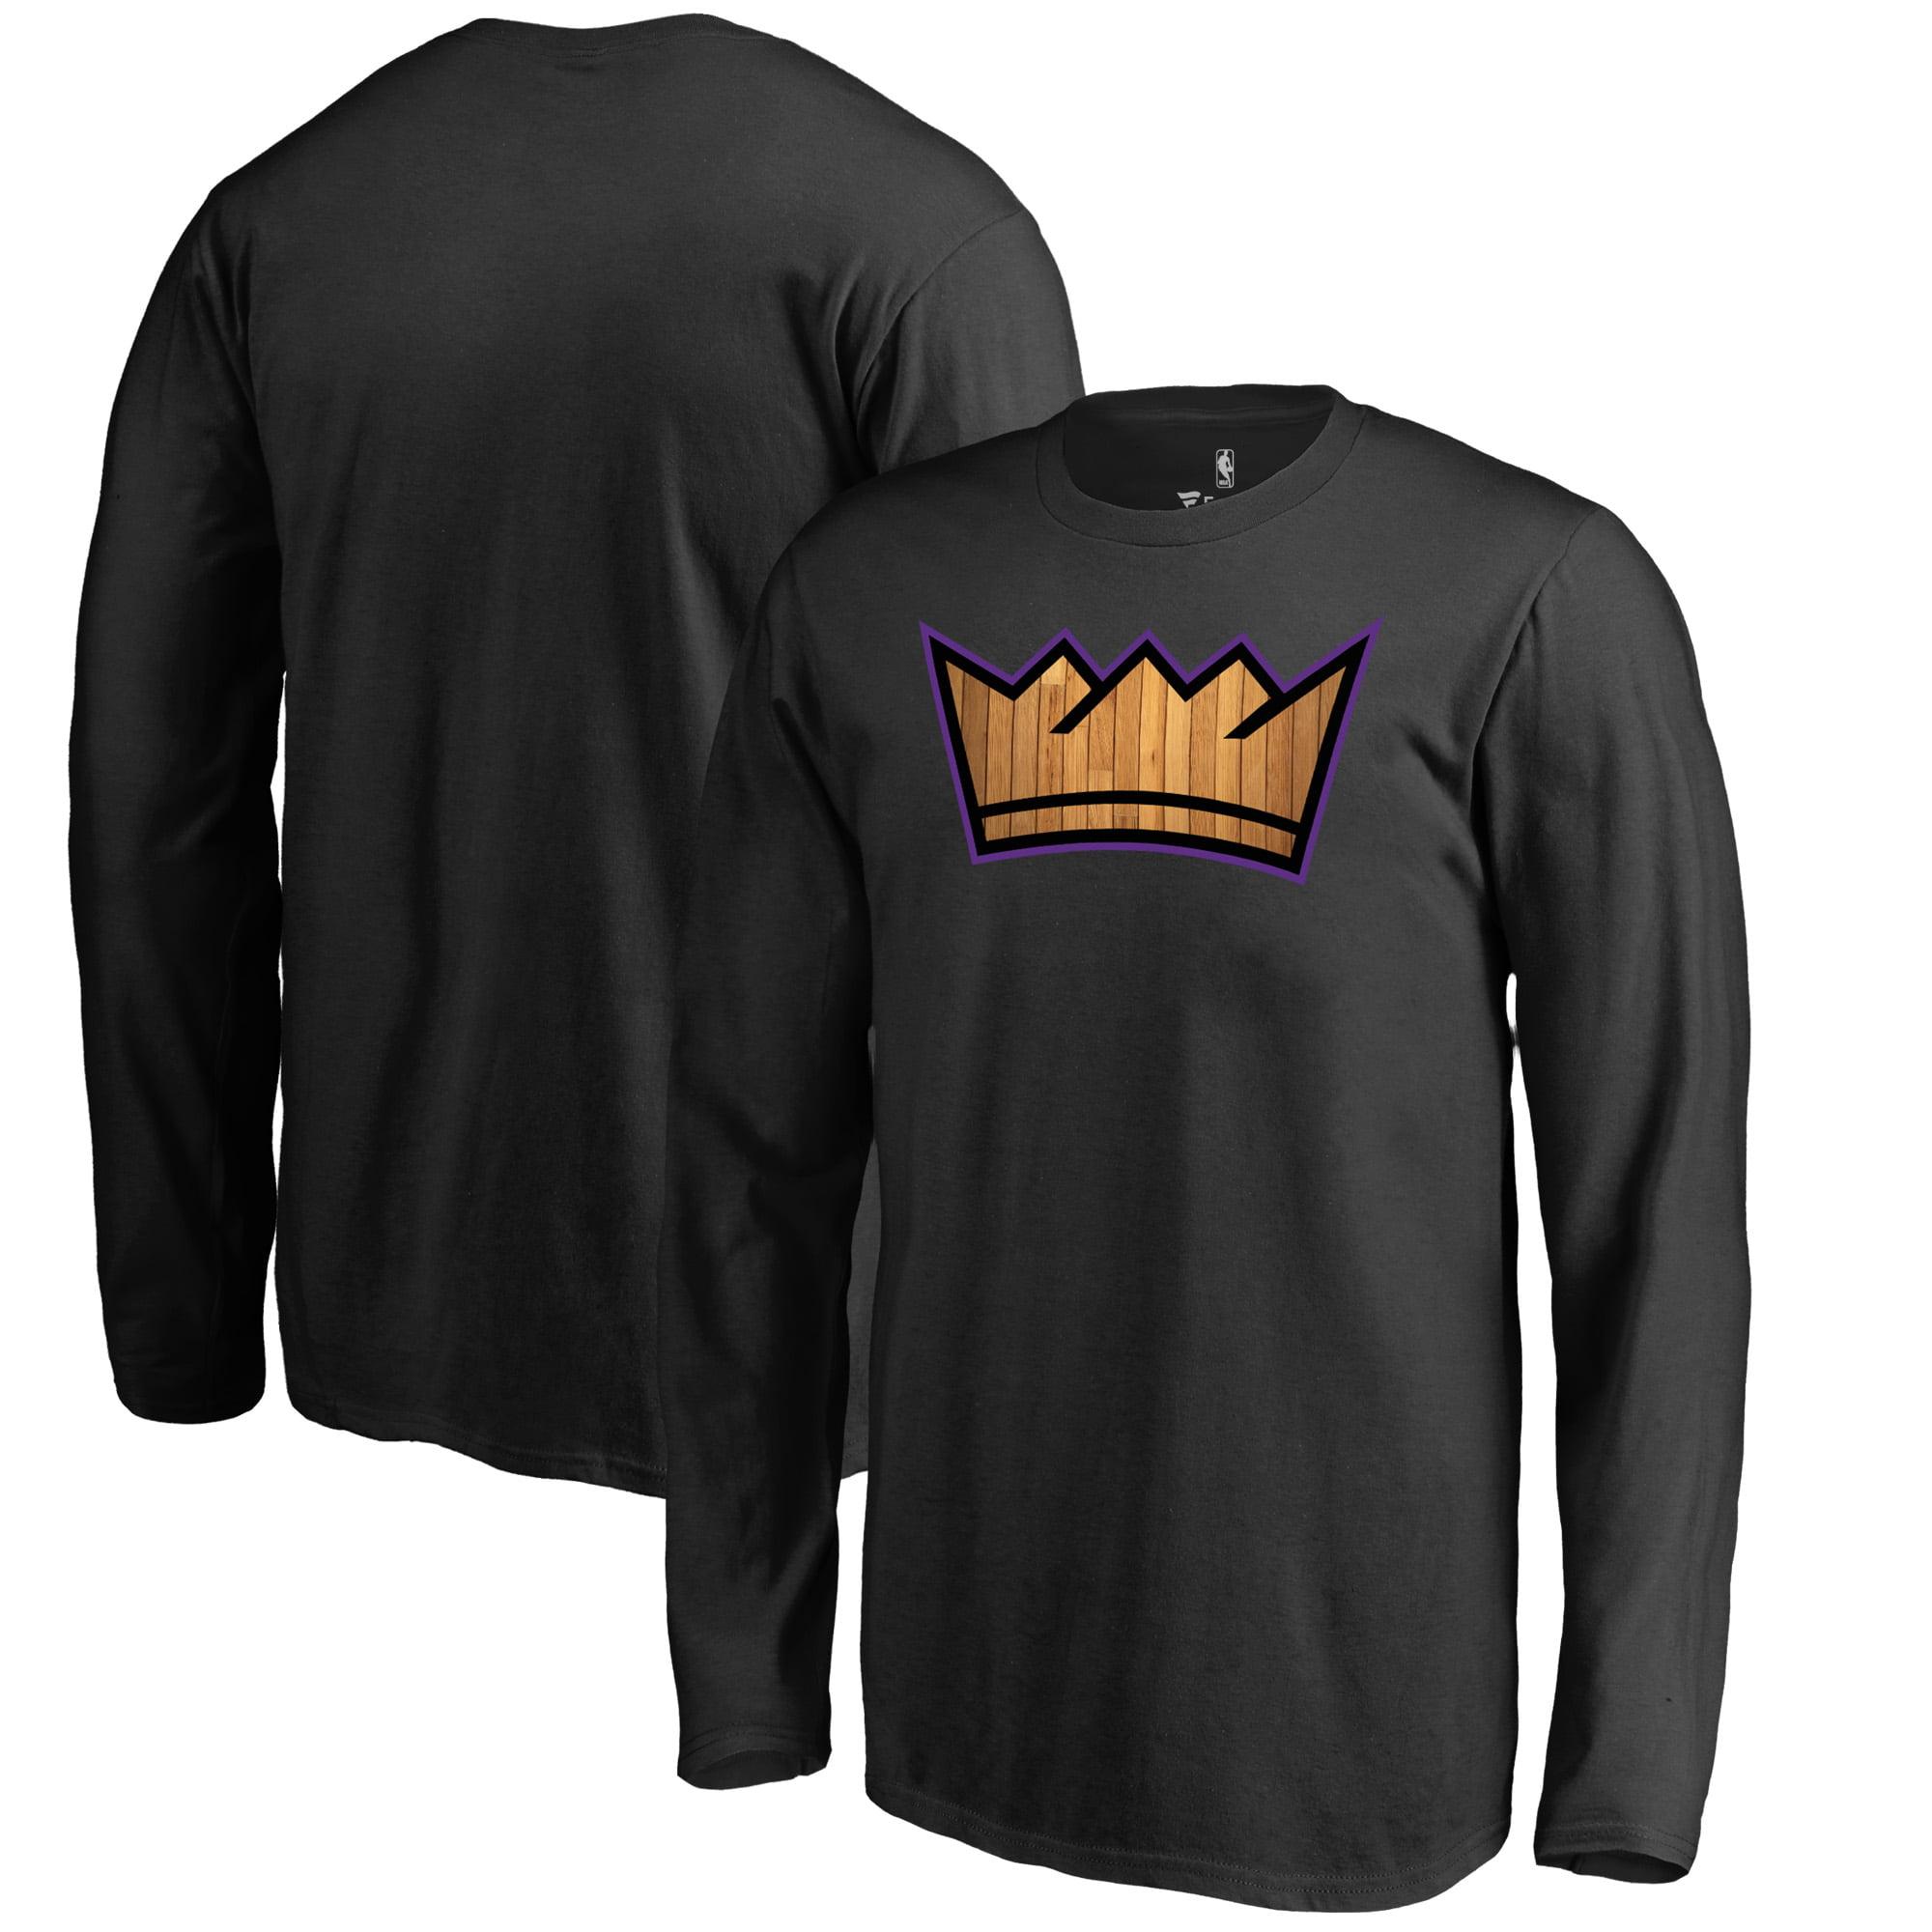 Sacramento Kings Fanatics Branded Youth Hardwood Long Sleeve T-Shirt - Black